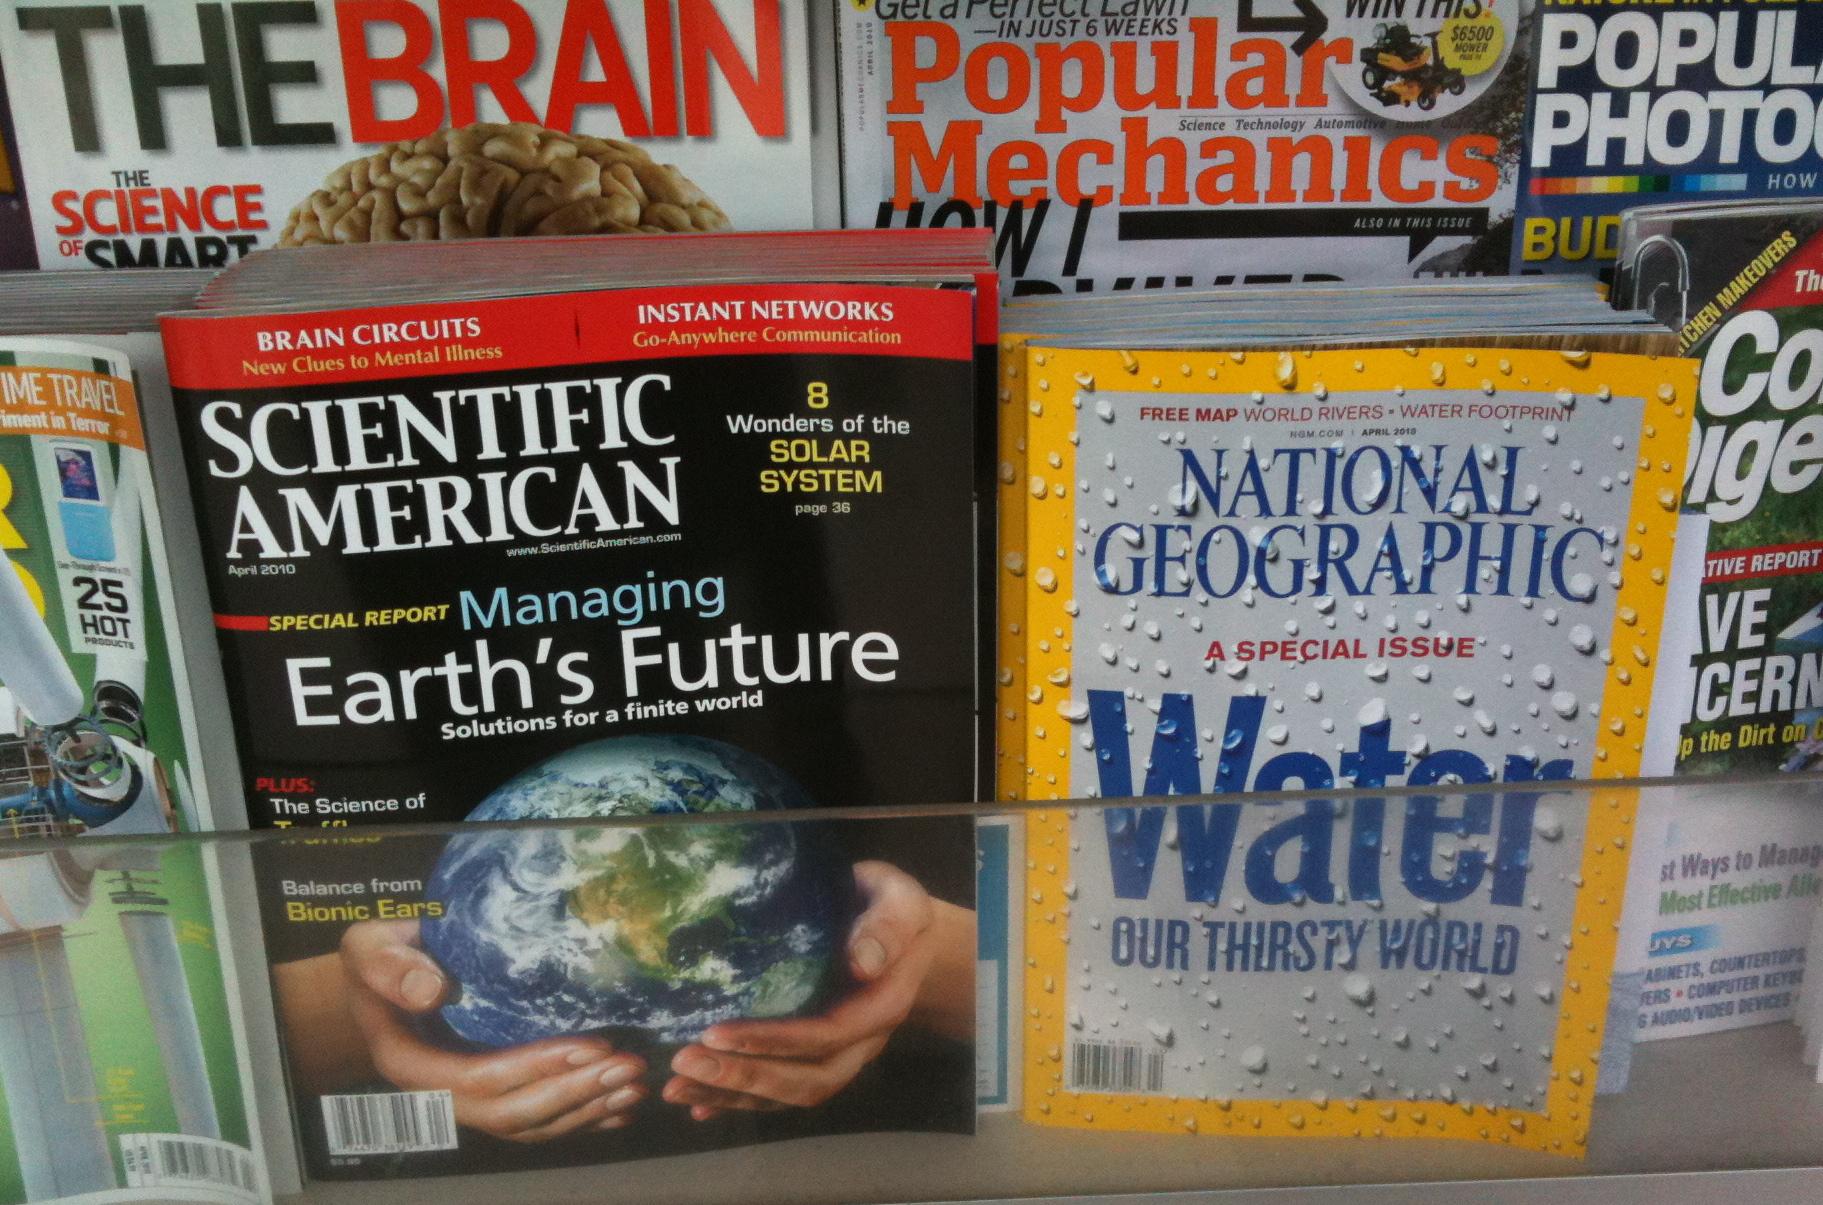 Scientific American Managing Earth's Future, National